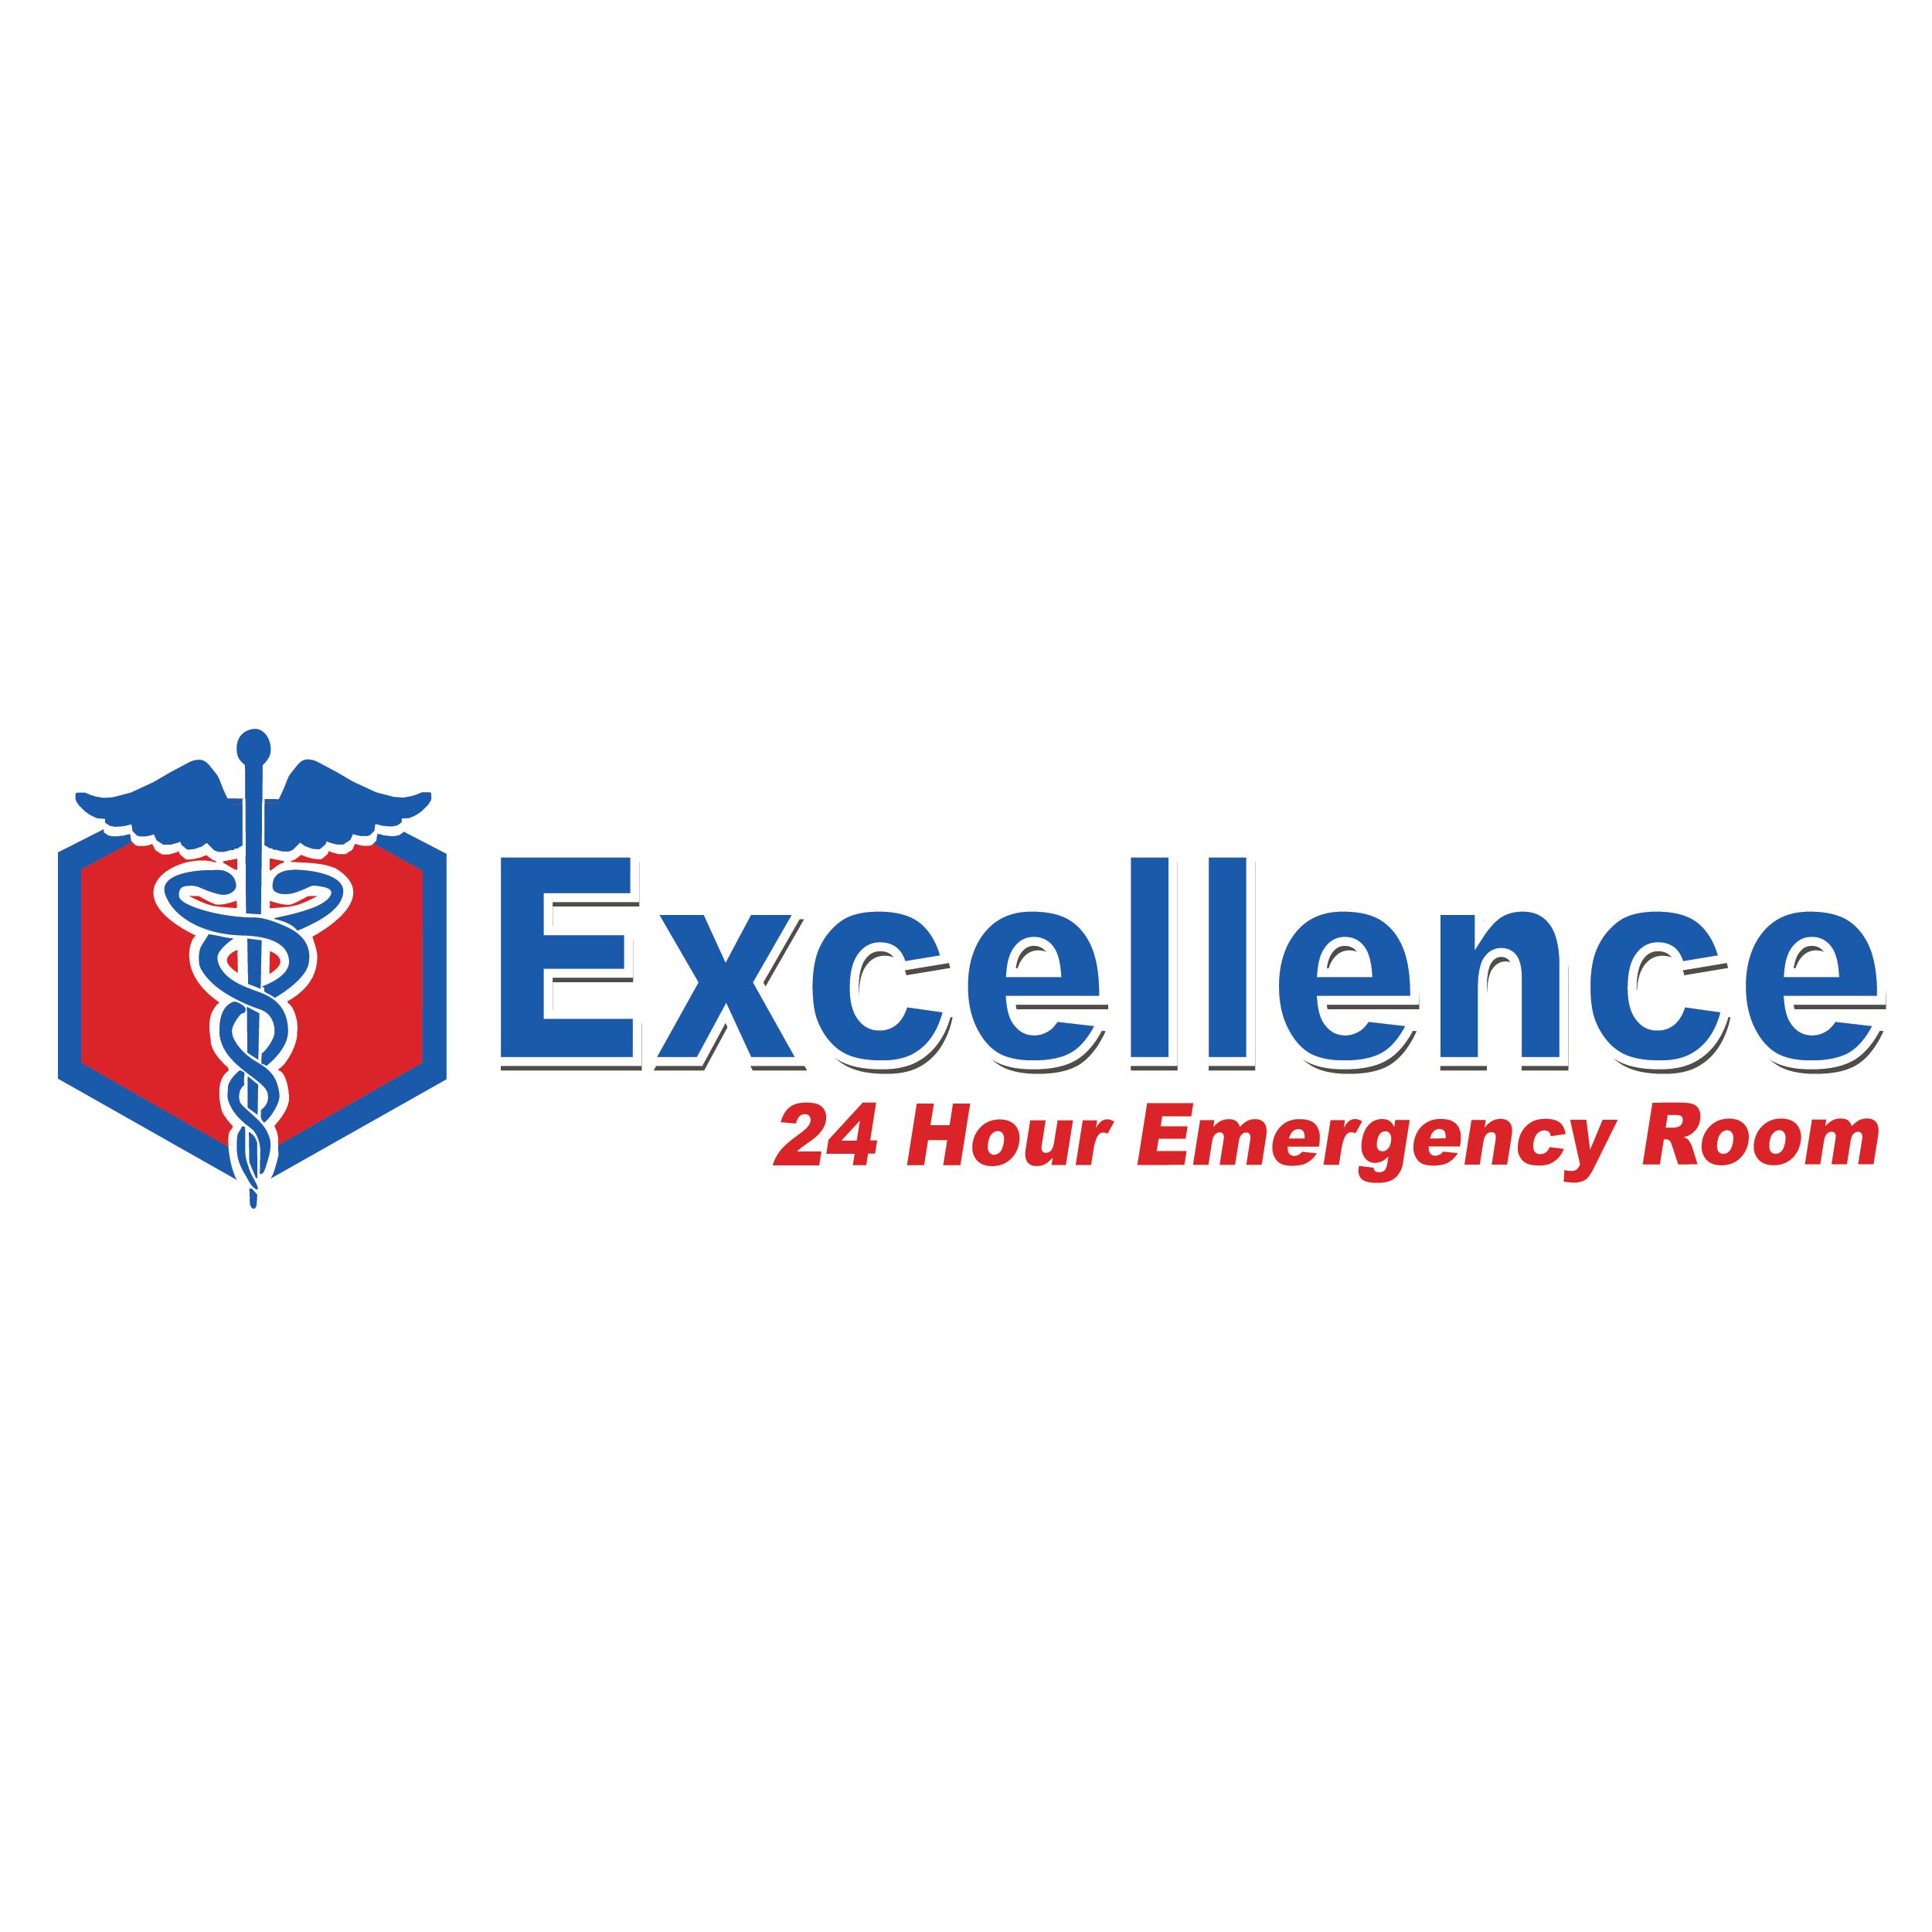 Excellence ER- East Houston - Houston, TX 77049 - (281)977-9800 | ShowMeLocal.com